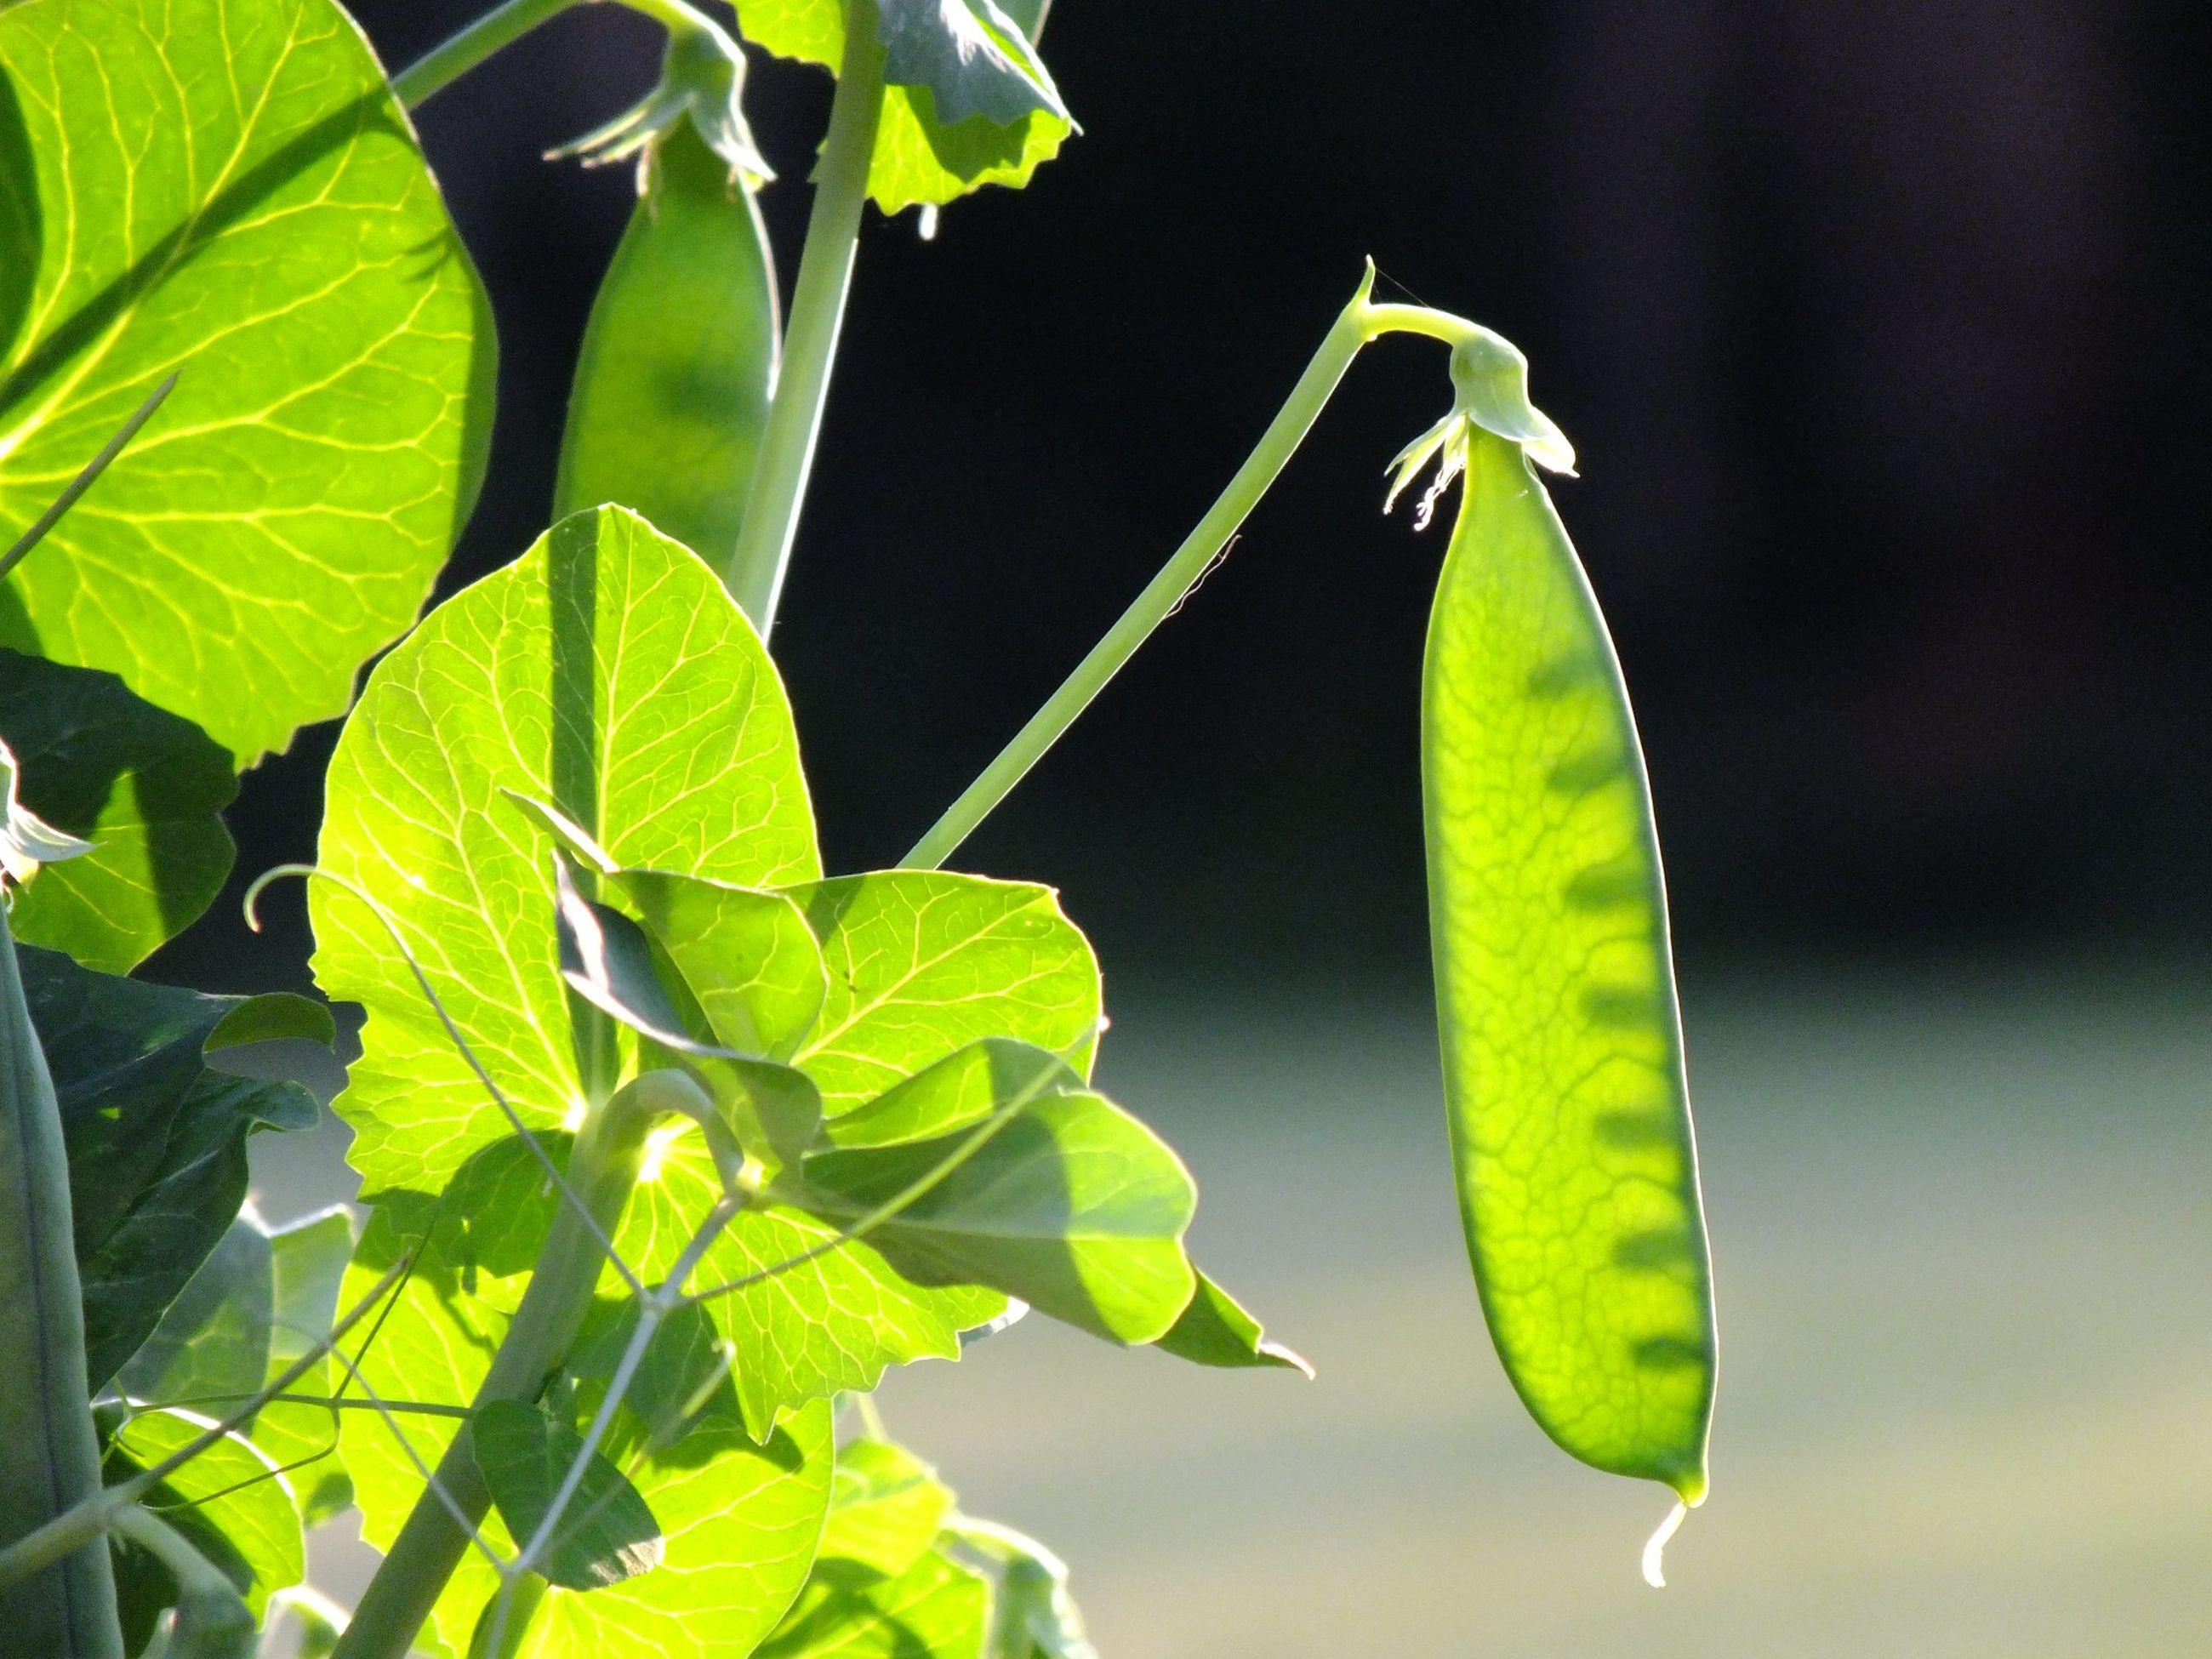 Peas in a pod close up